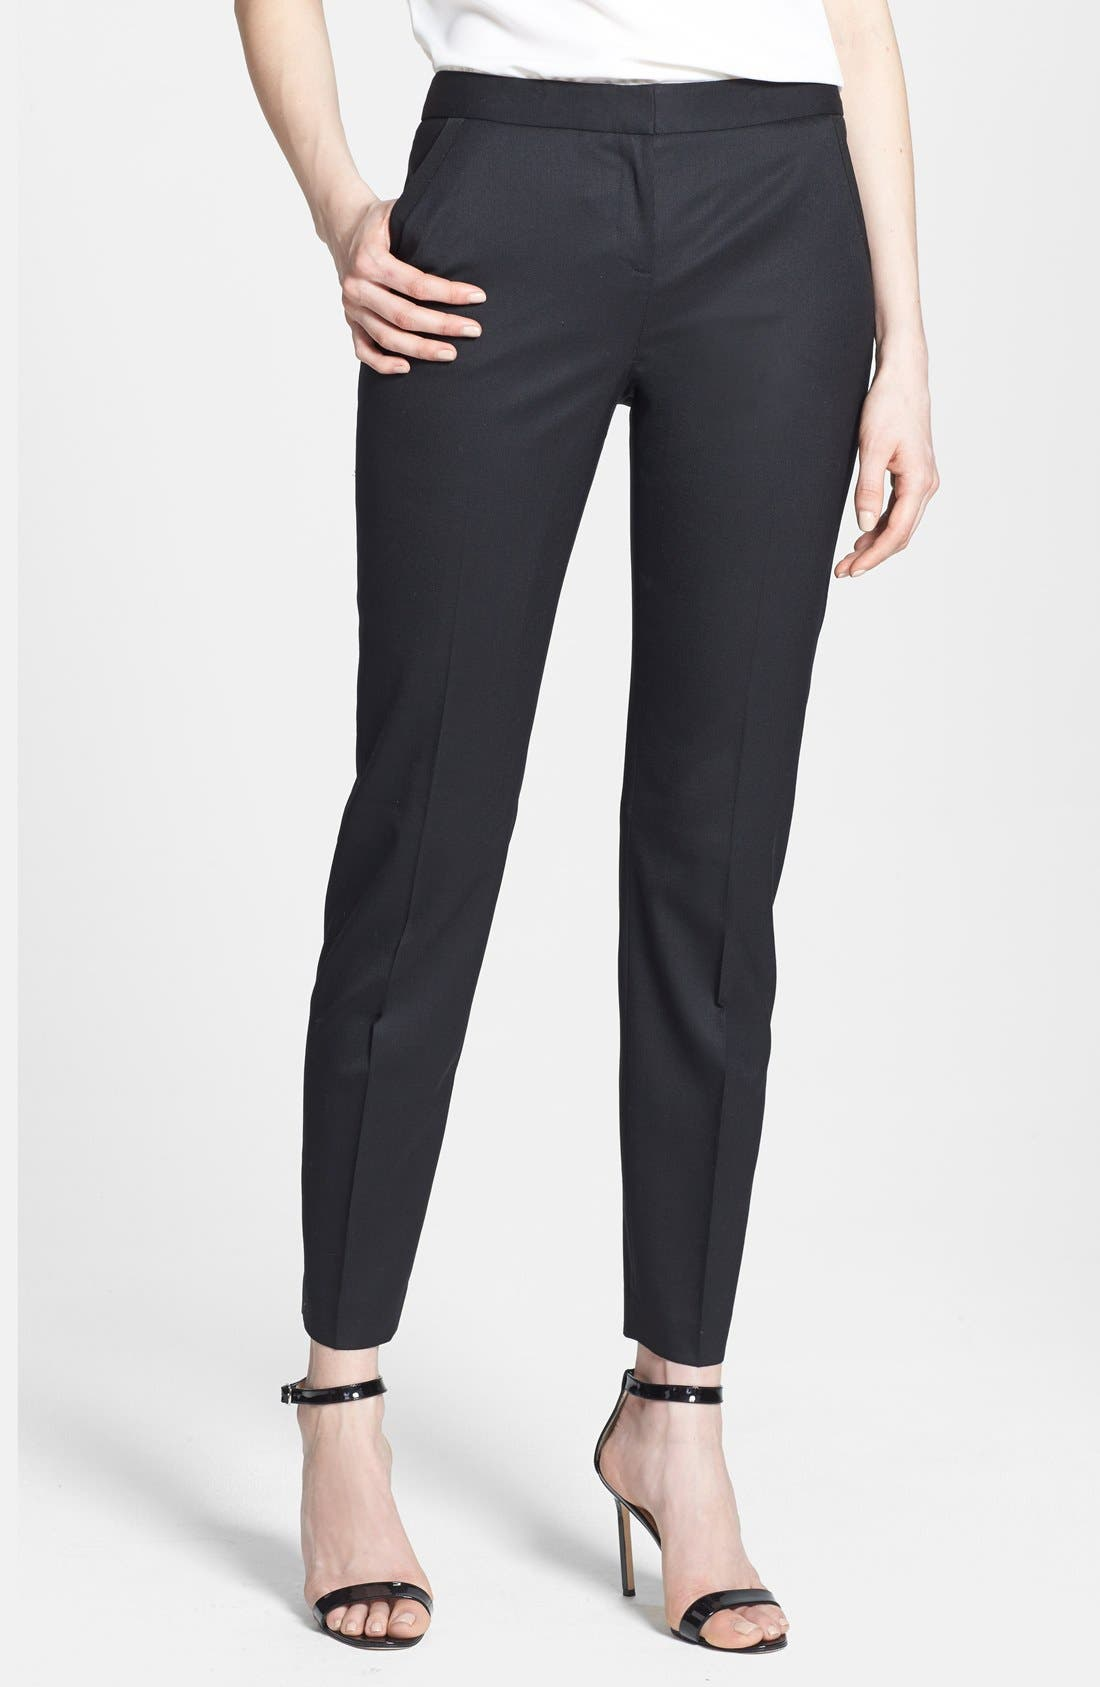 Alternate Image 1 Selected - Ted Baker London Slim Leg Stretch Trousers